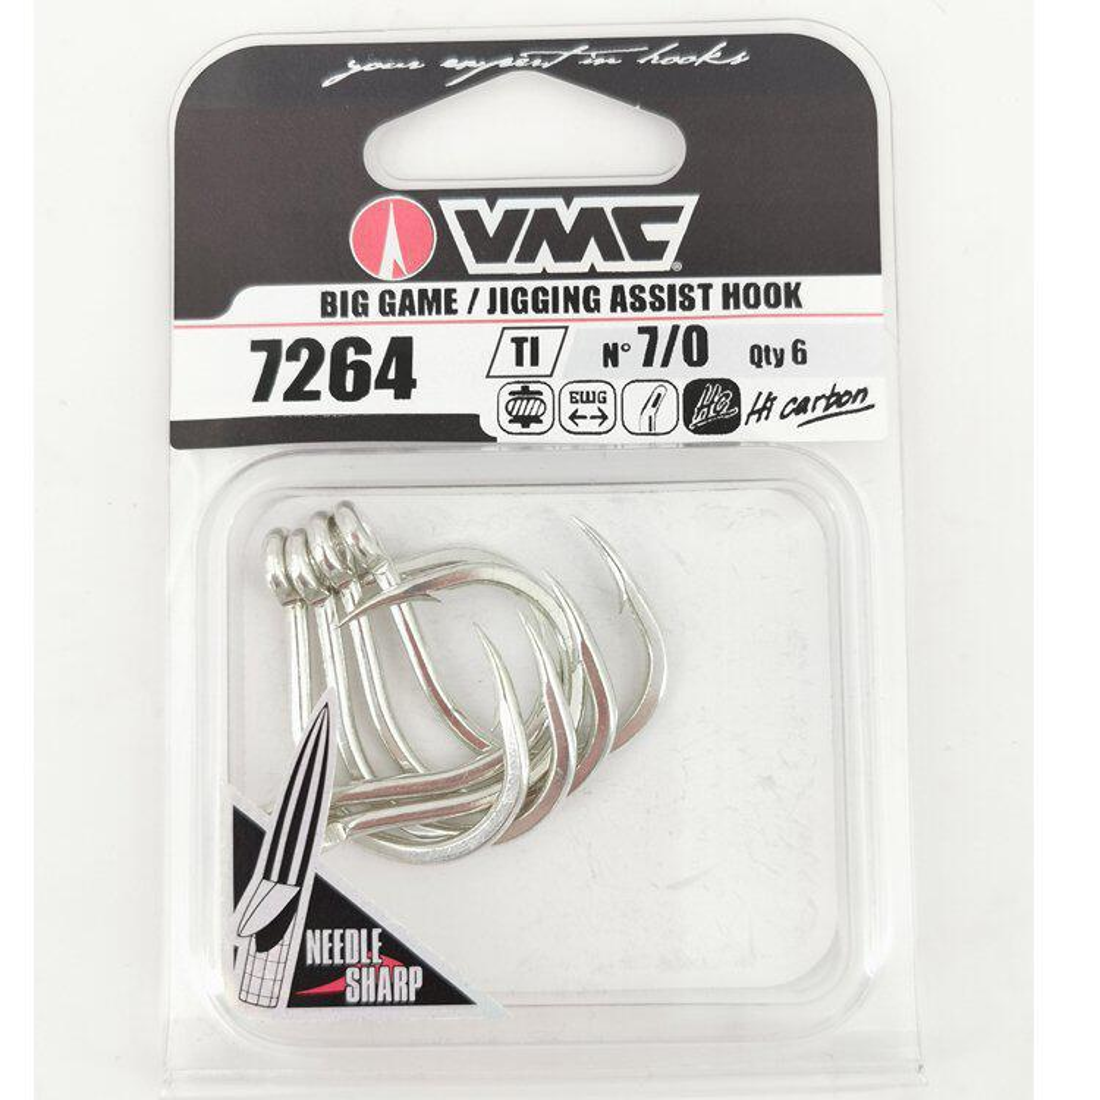 3//0 5//0 7//0 2 Stück für Speedjigs Jig VMC Assist Hook 7264 Heavy Duty Single Gr